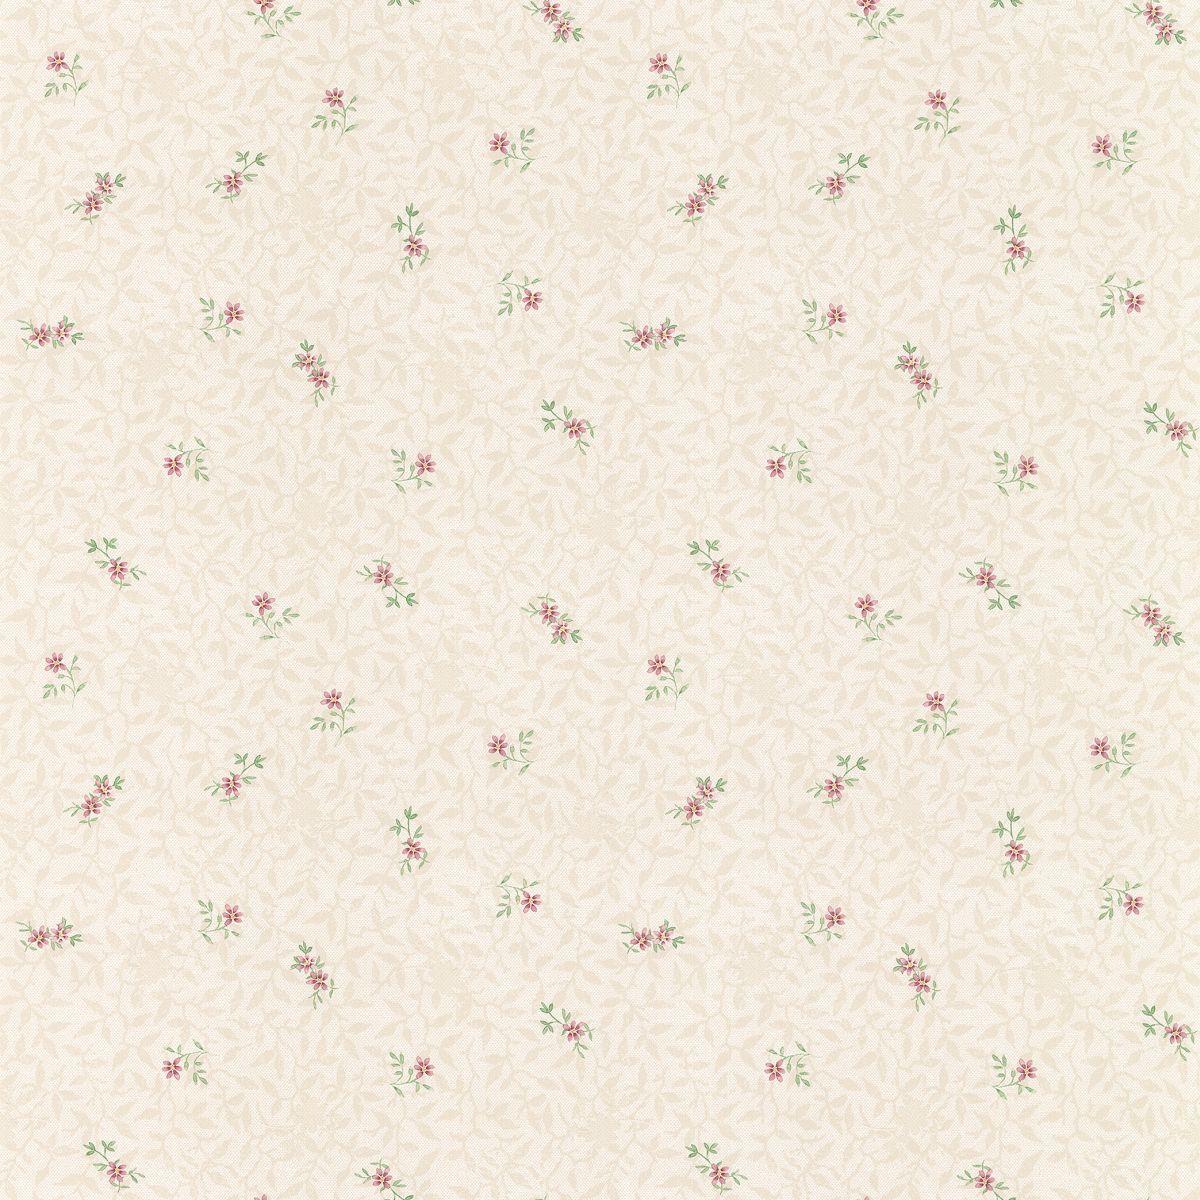 papier vinyl tapete mit blumen pp27837 vinyltapete. Black Bedroom Furniture Sets. Home Design Ideas